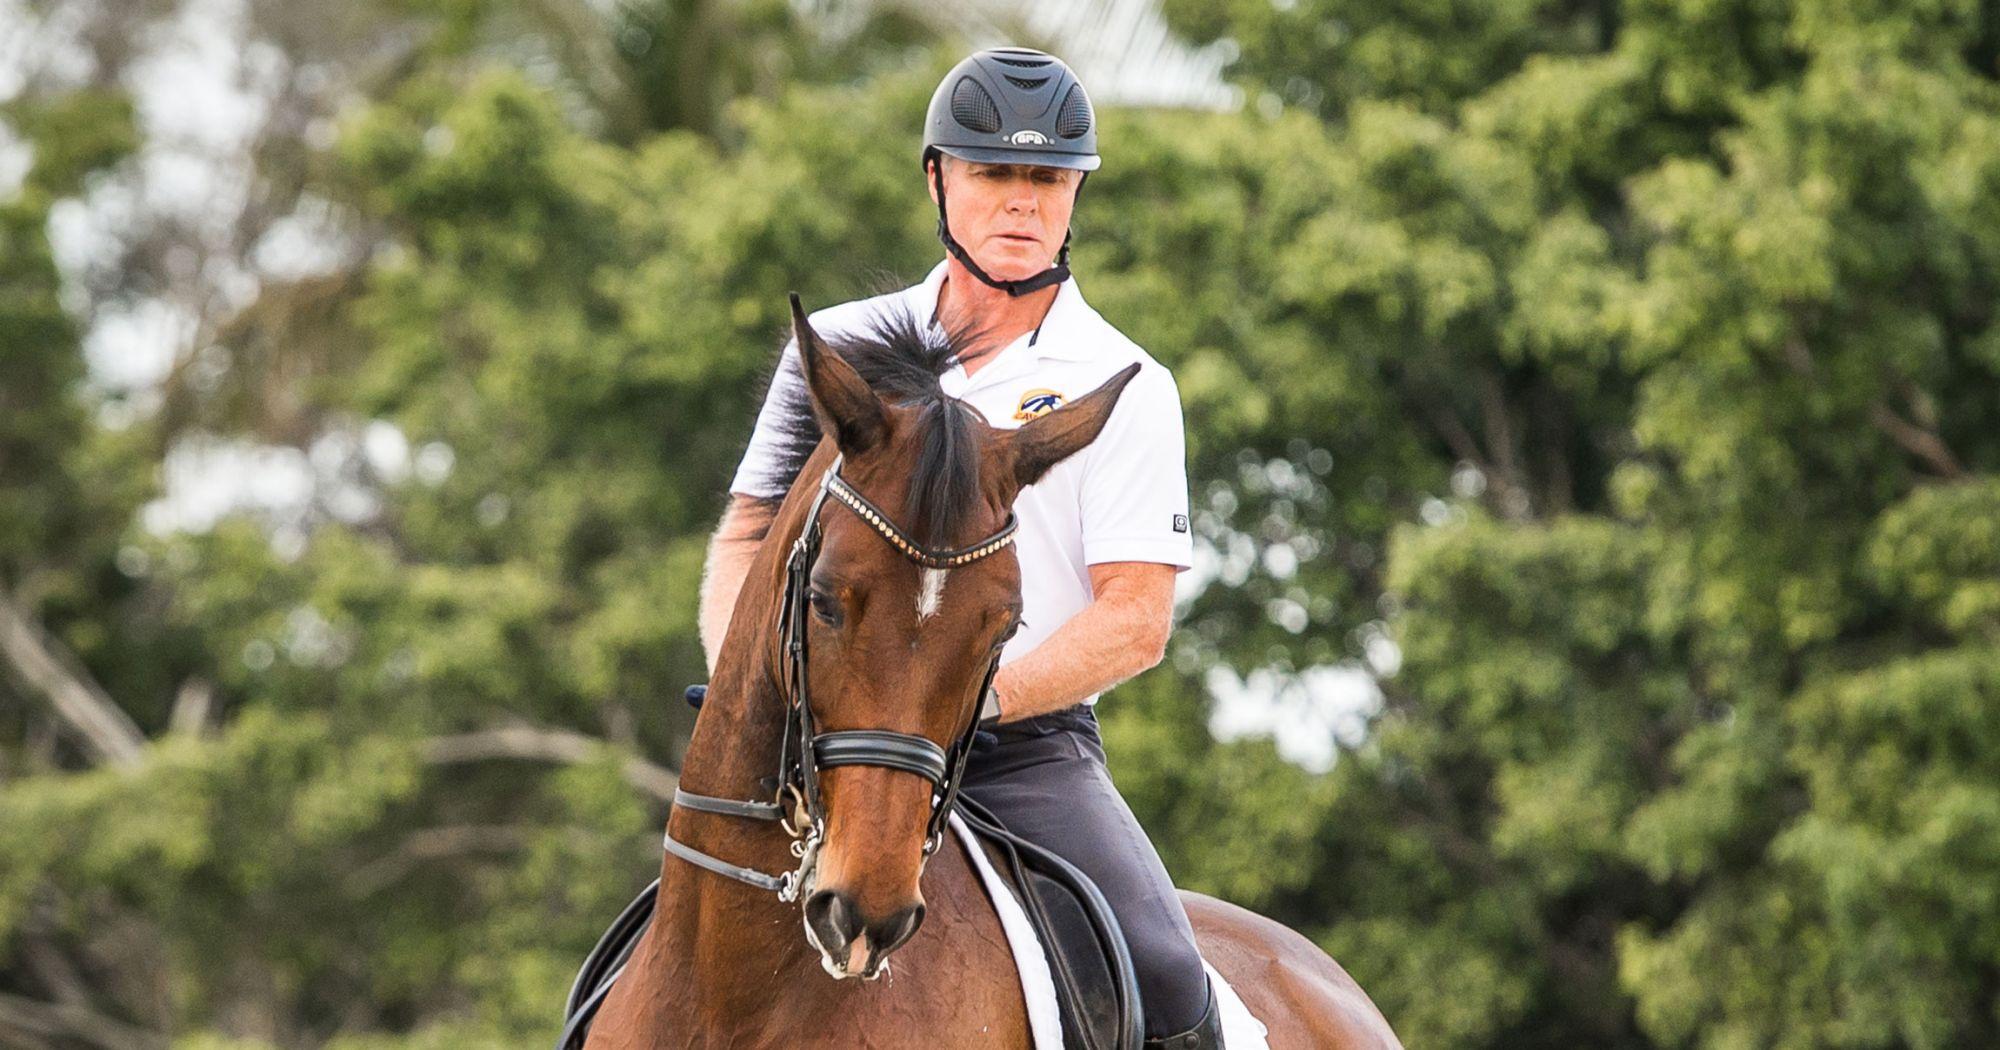 Jan Ebeling, the Dressage trainer, courtesy of Cavalor